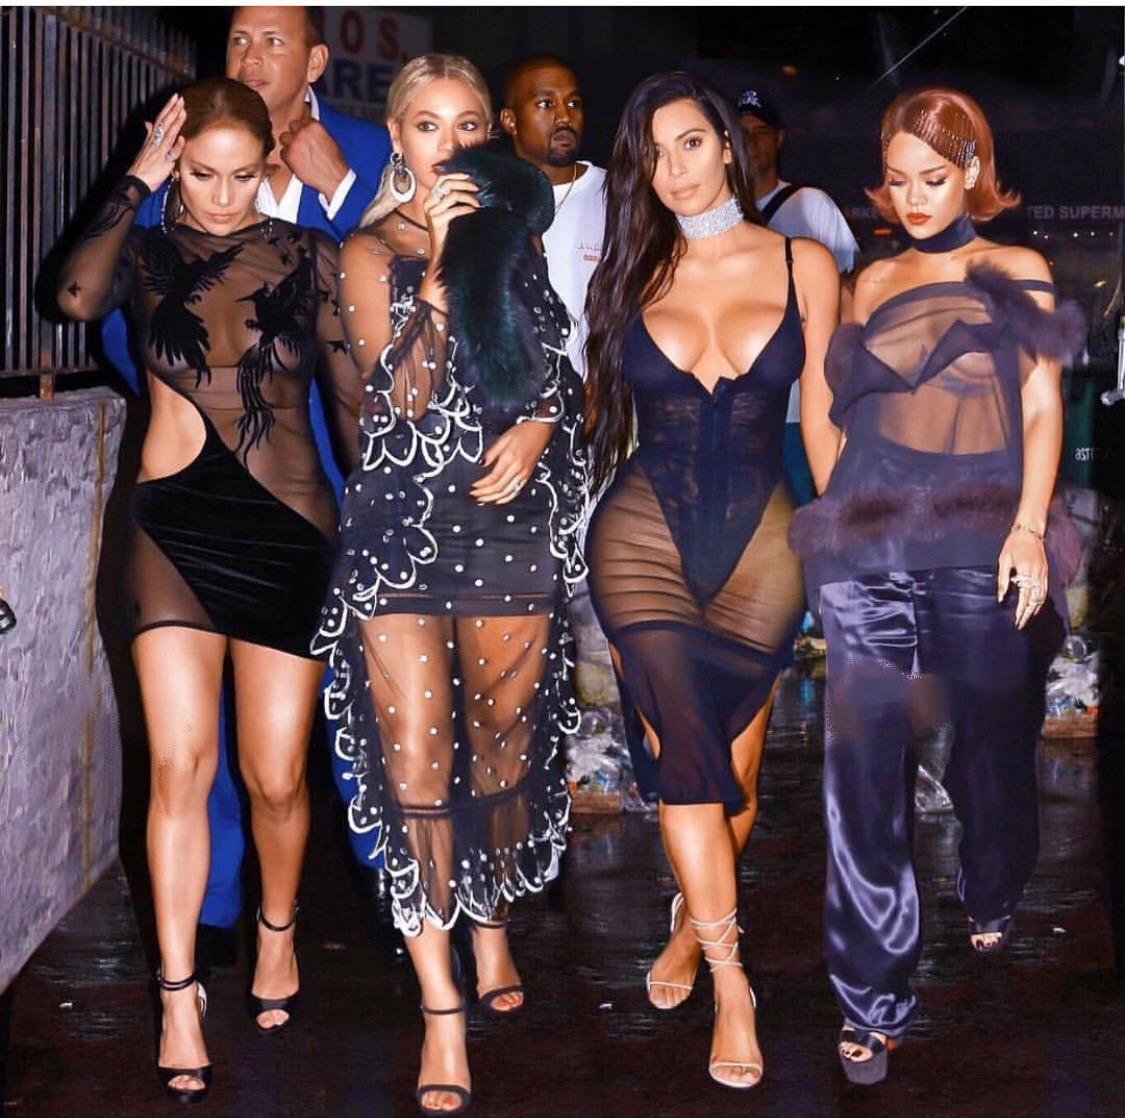 Beyonce, Kim, JLo, Riri all in one fest